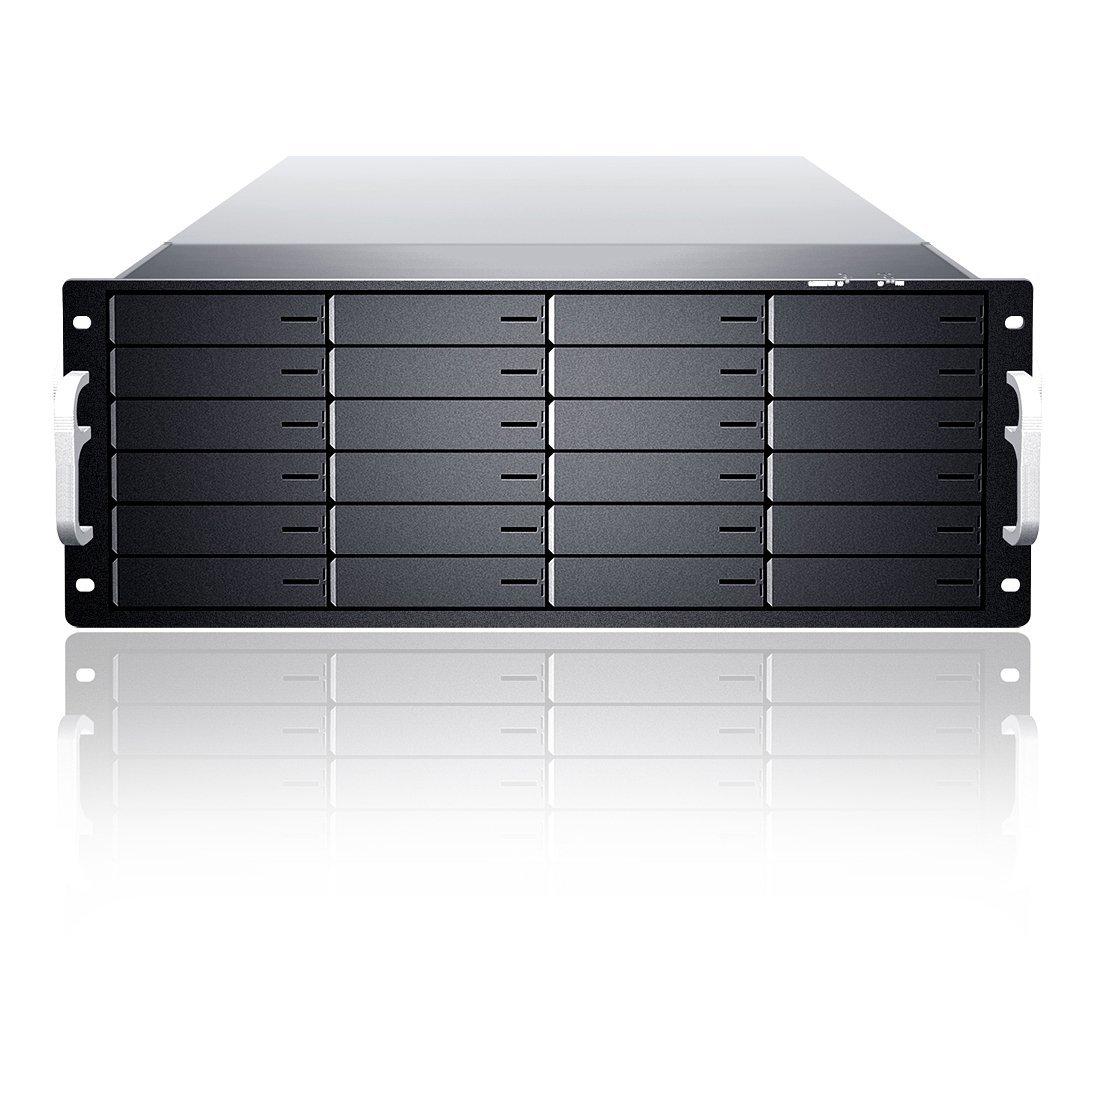 Sans Digital Storage EN424L? 4U 24Bay Xeon Quad Core 6G SAS/SATA2 RAID 60NAS? Brown Box